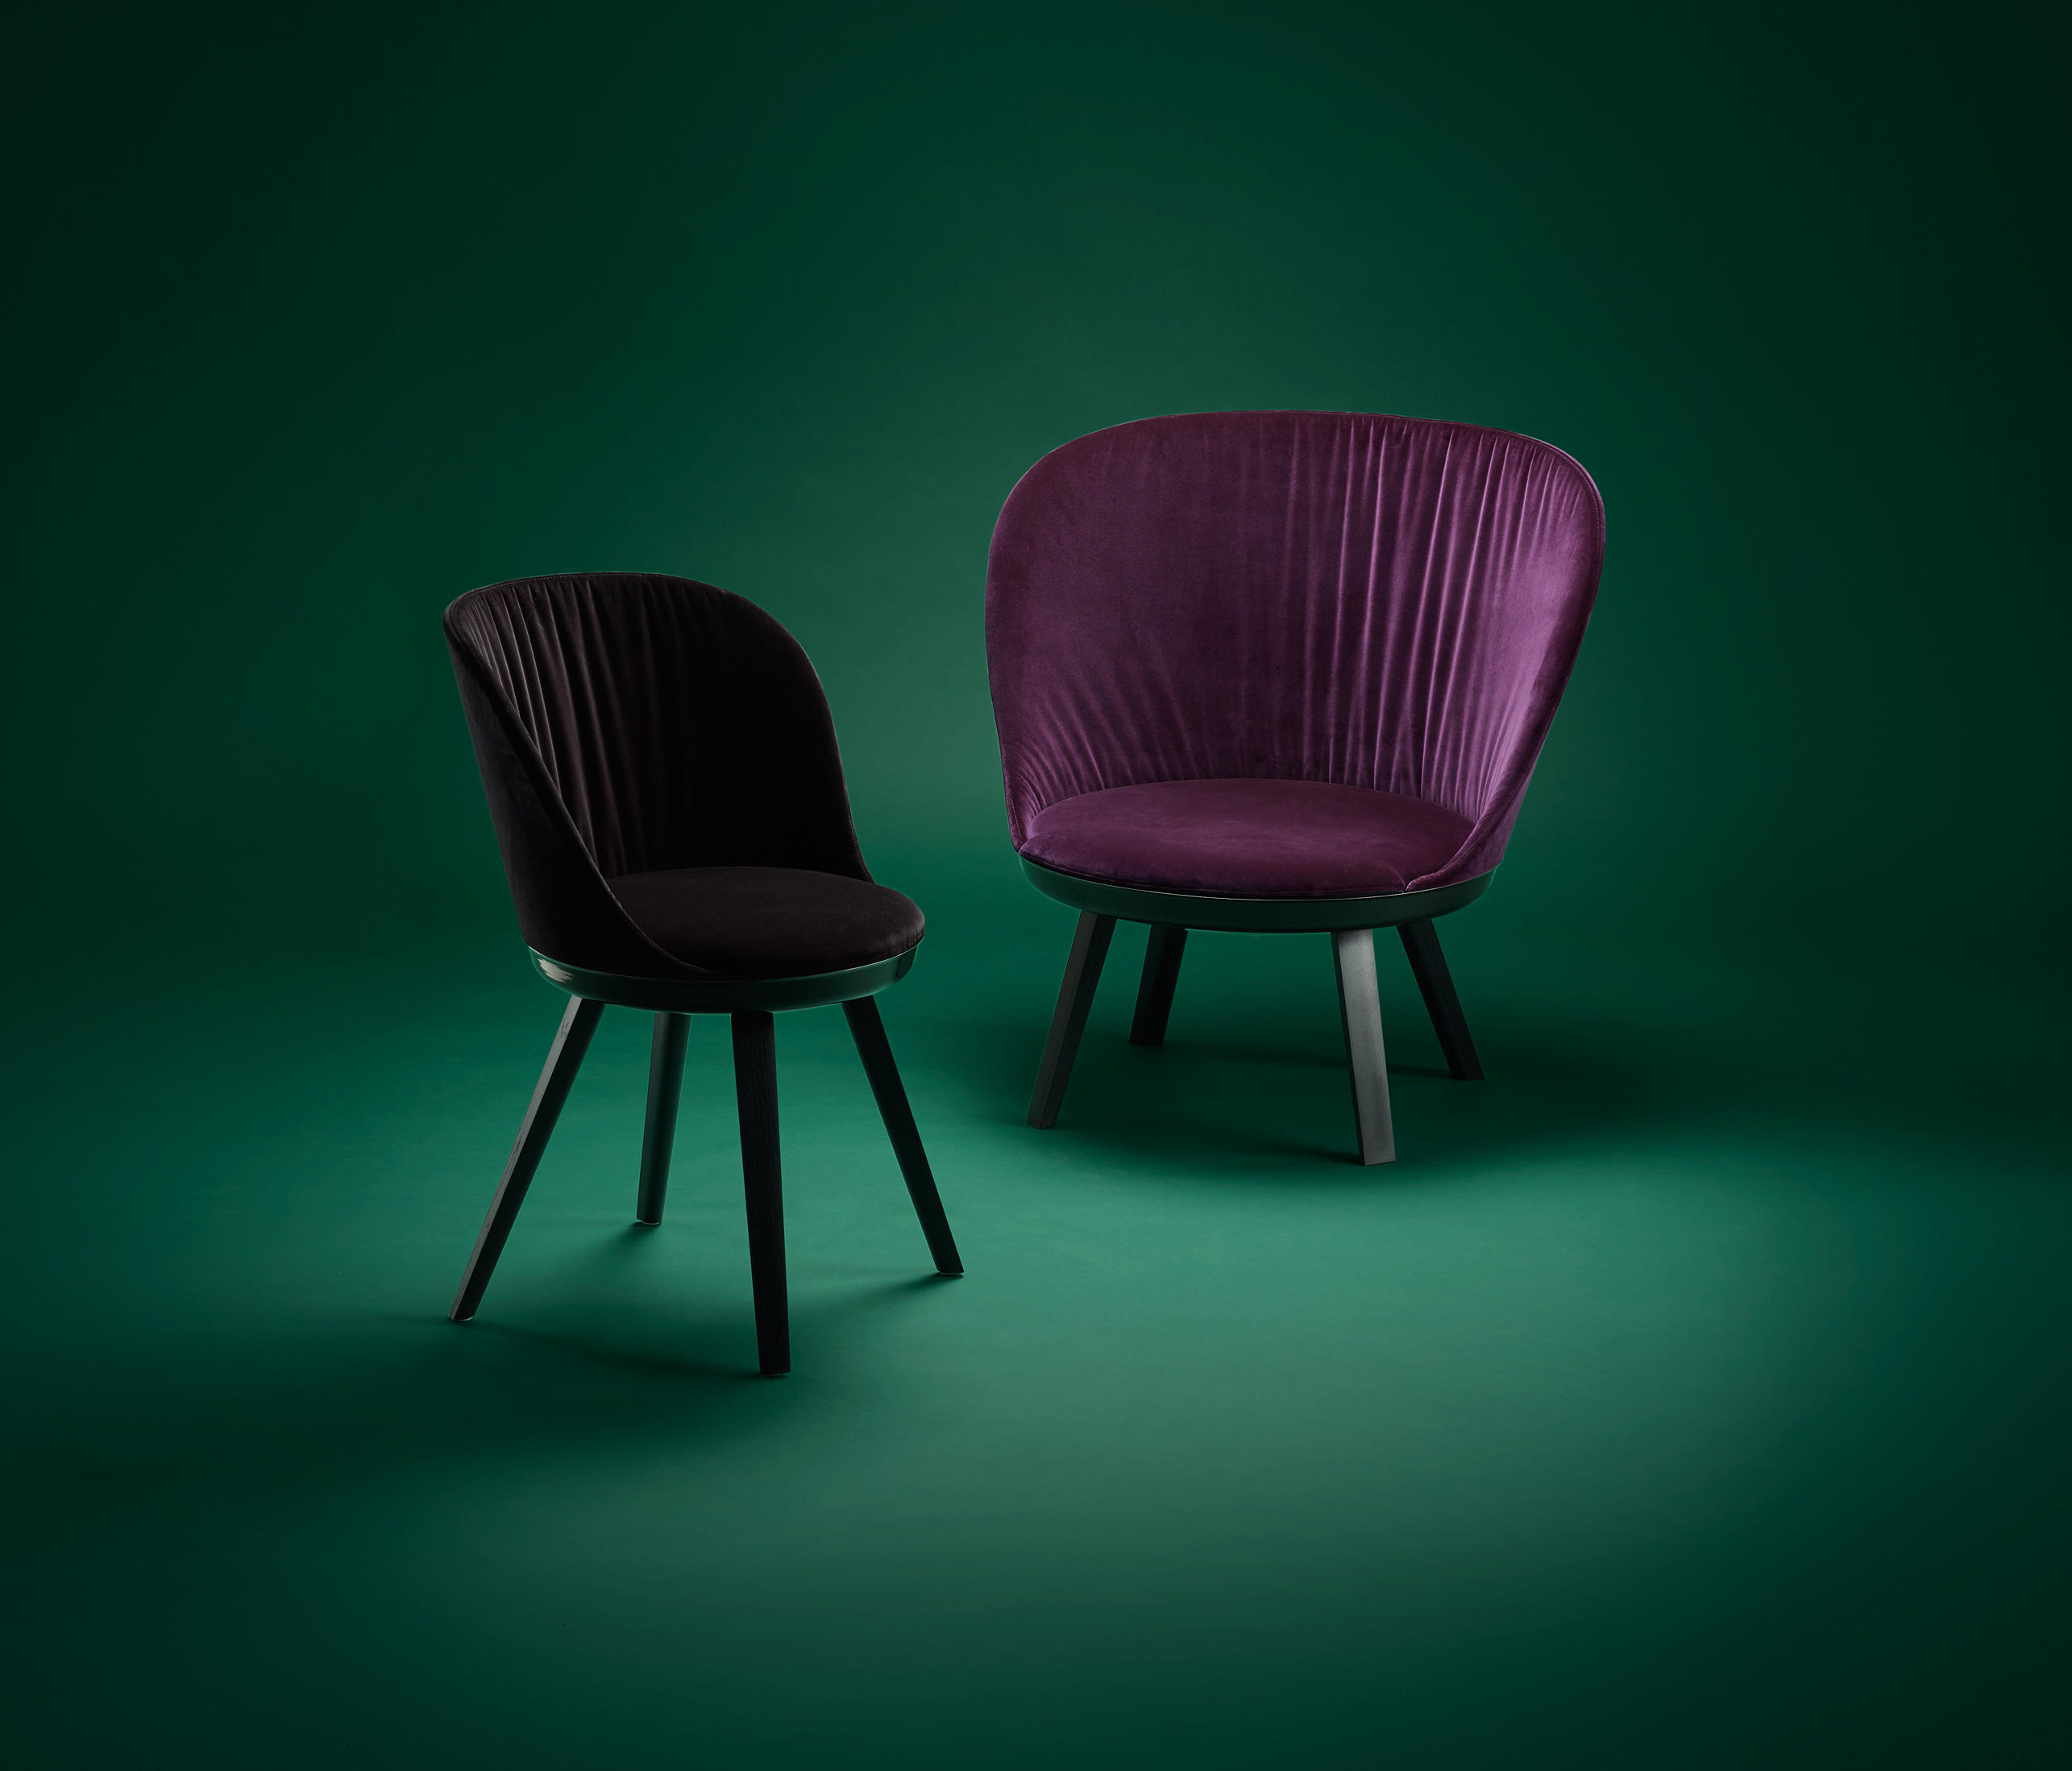 romy stuhl st hle von freifrau sitzm belmanufaktur architonic. Black Bedroom Furniture Sets. Home Design Ideas